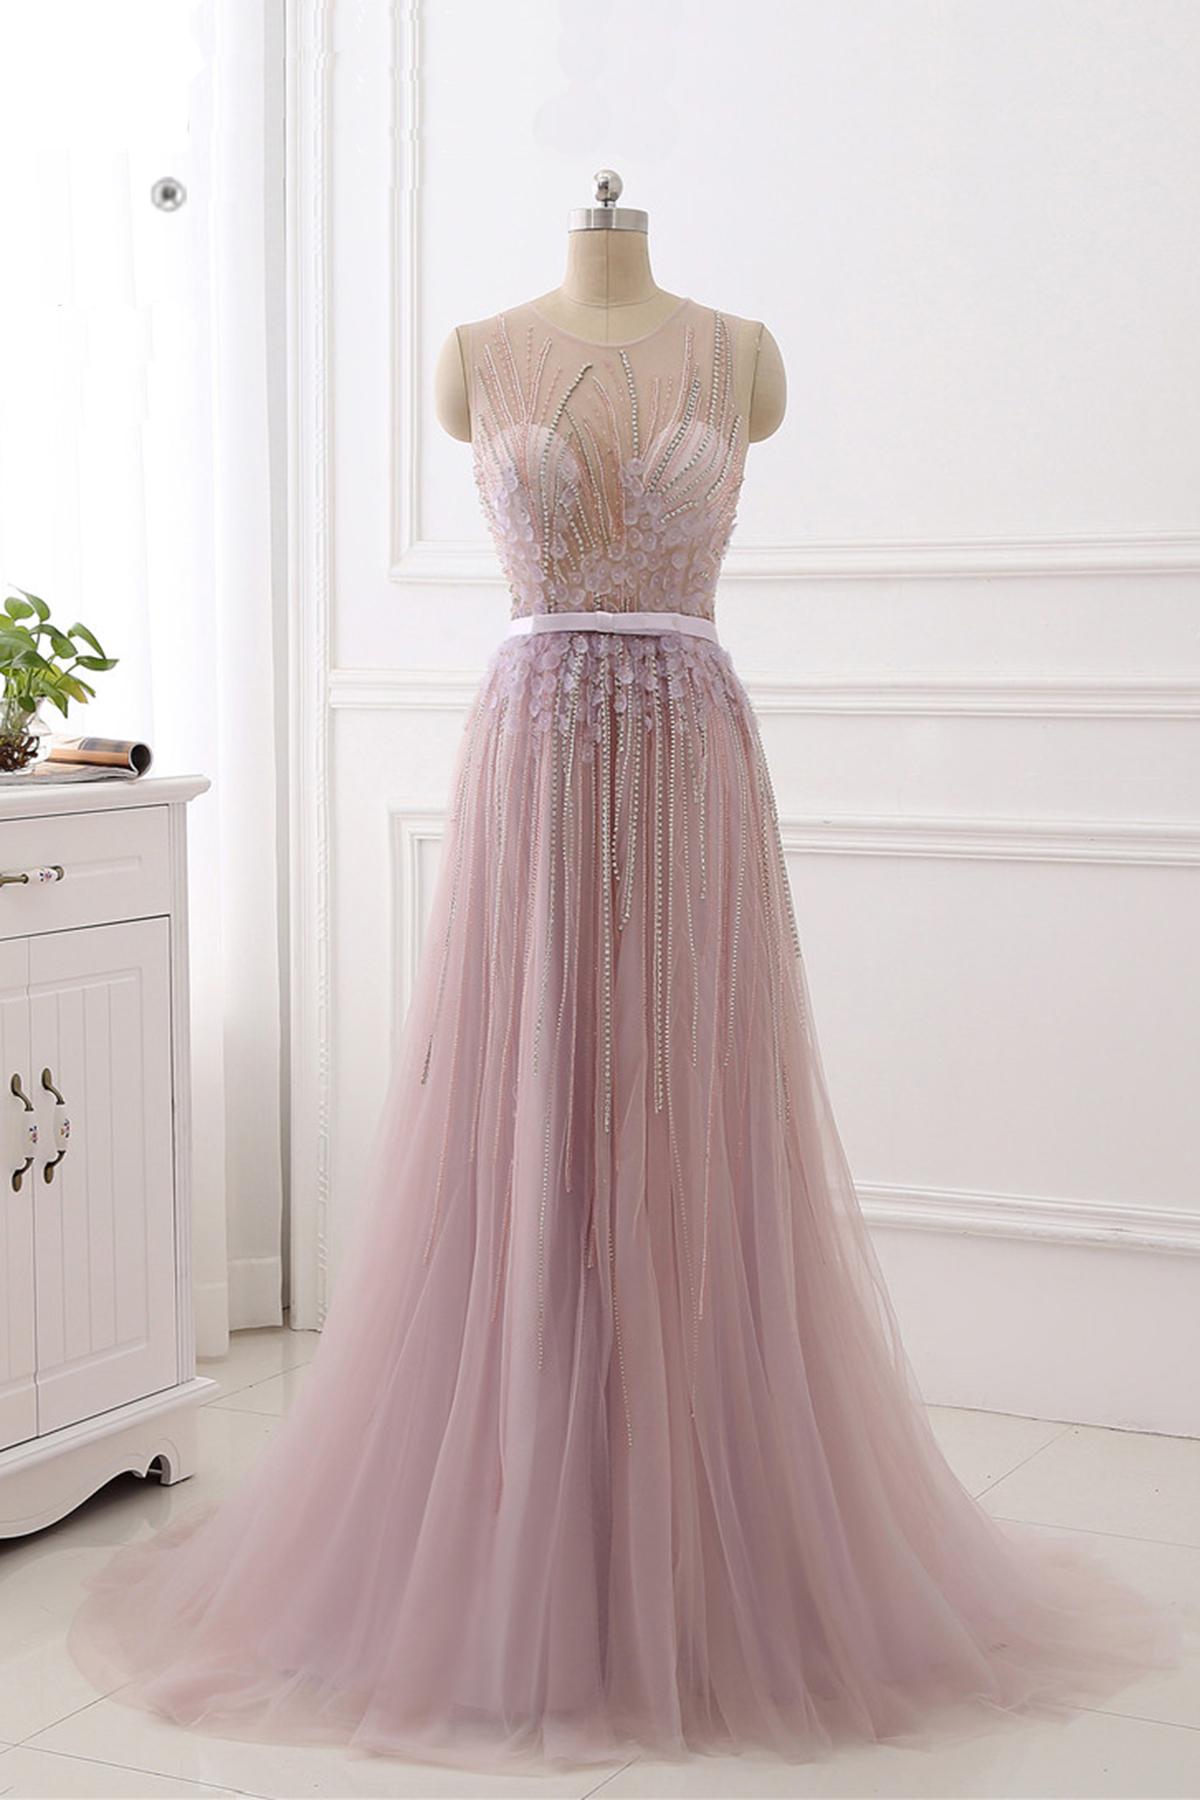 3D Flower Prom Dress